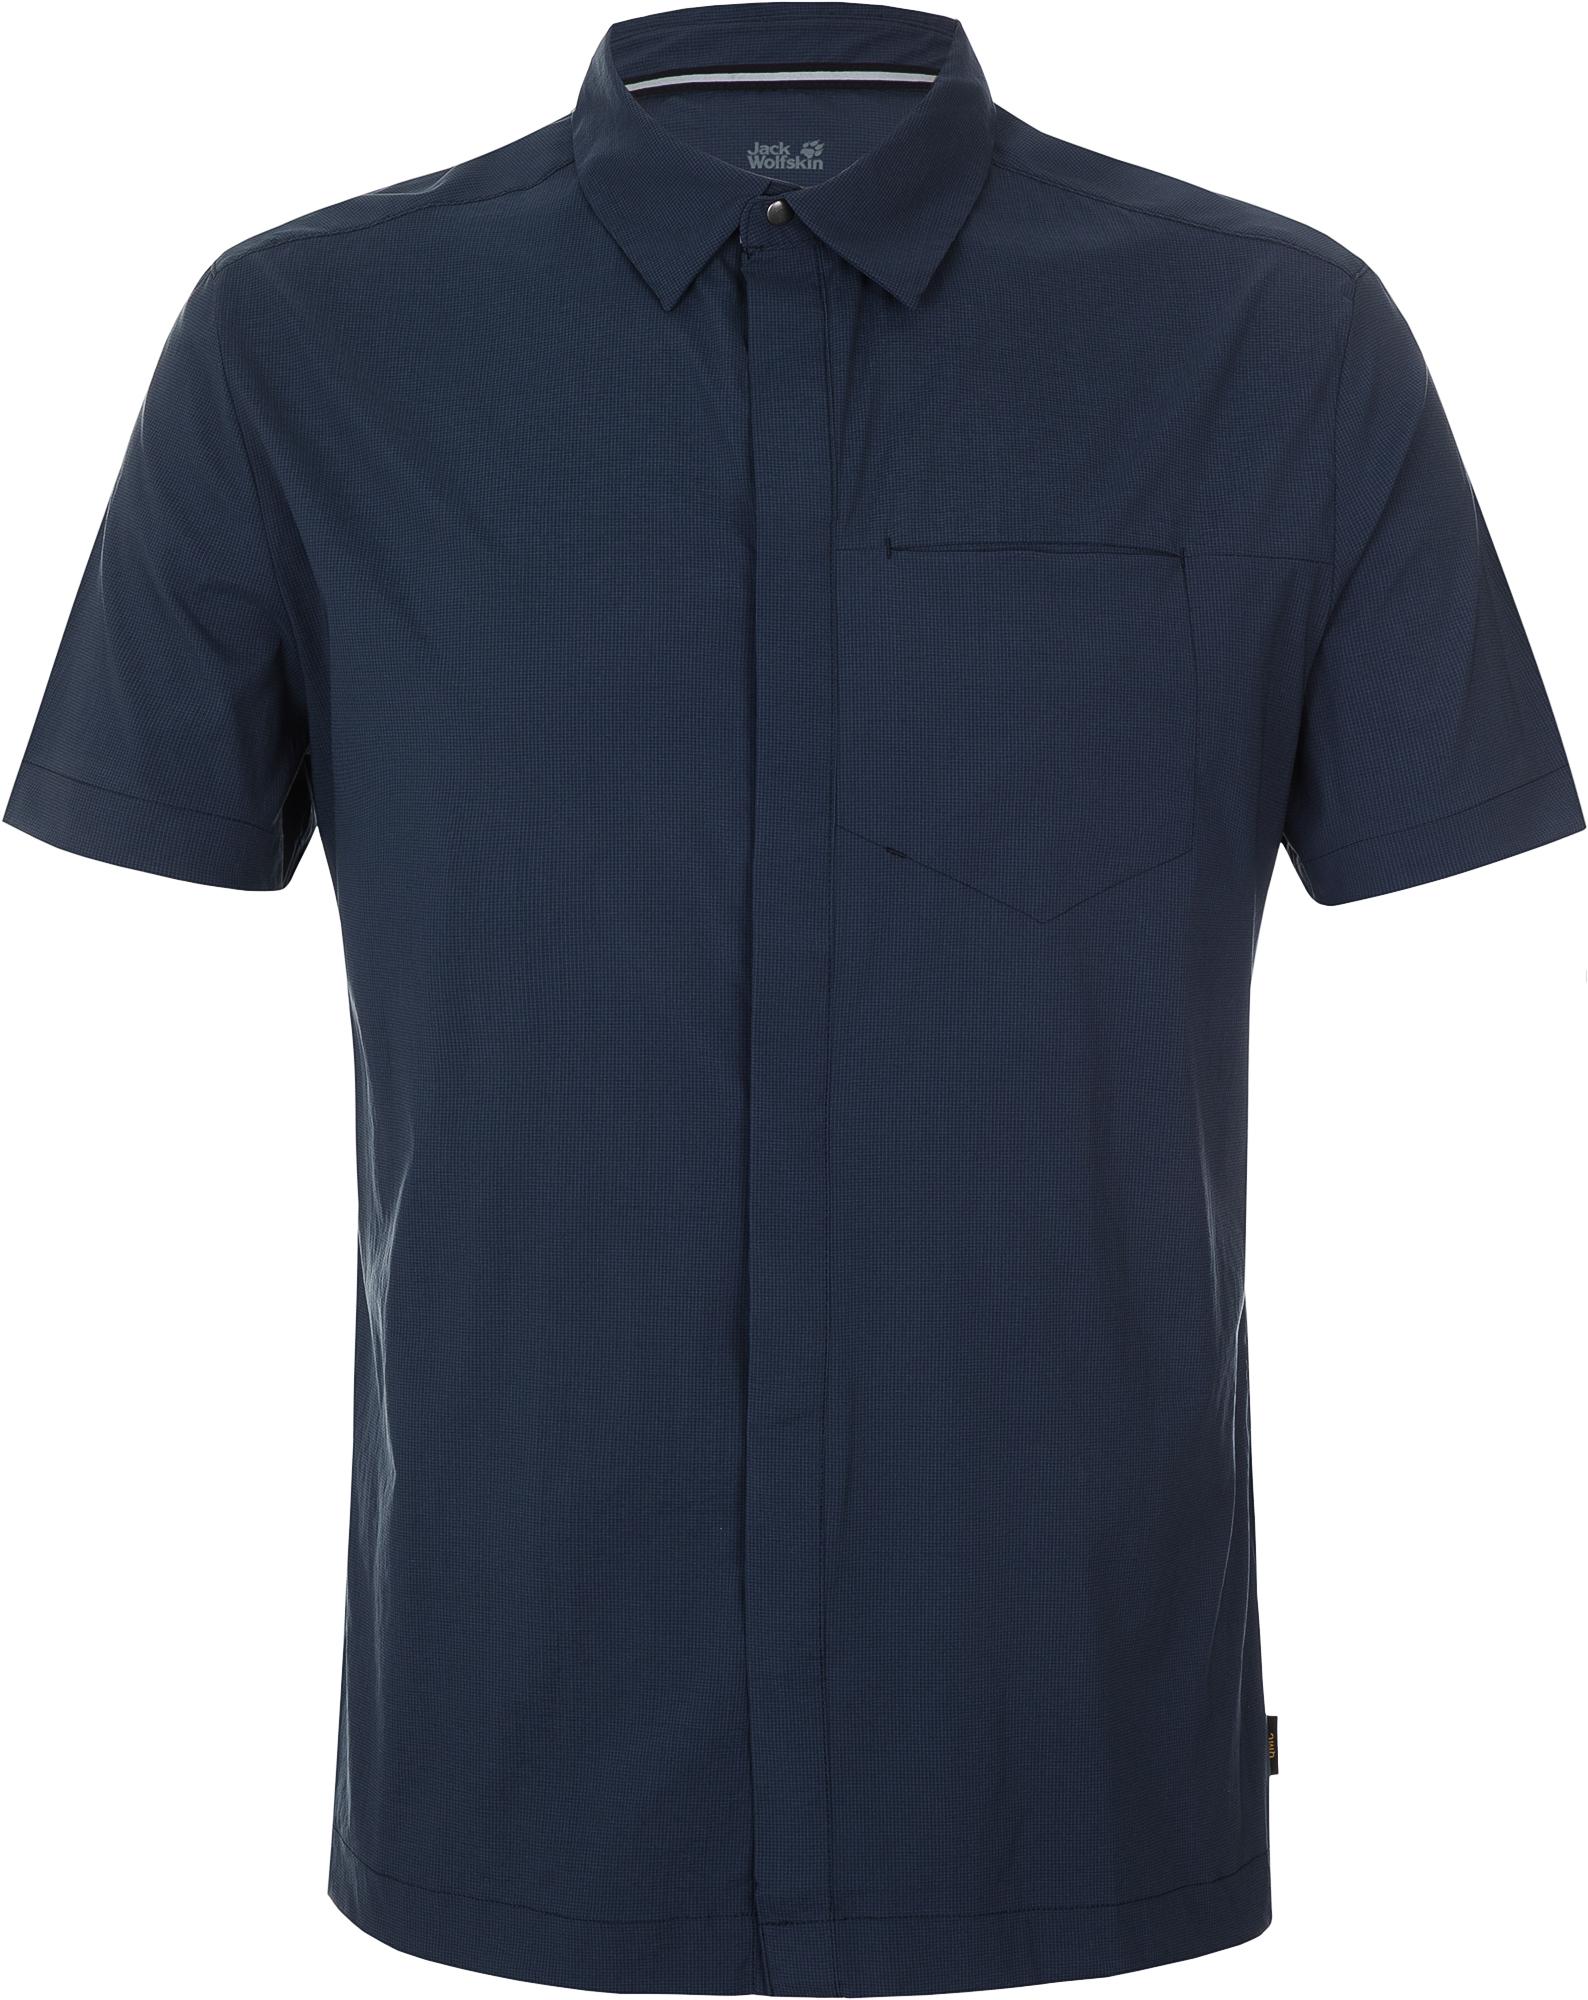 Jack Wolfskin Рубашка мужская JACK WOLFSKIN, размер 58